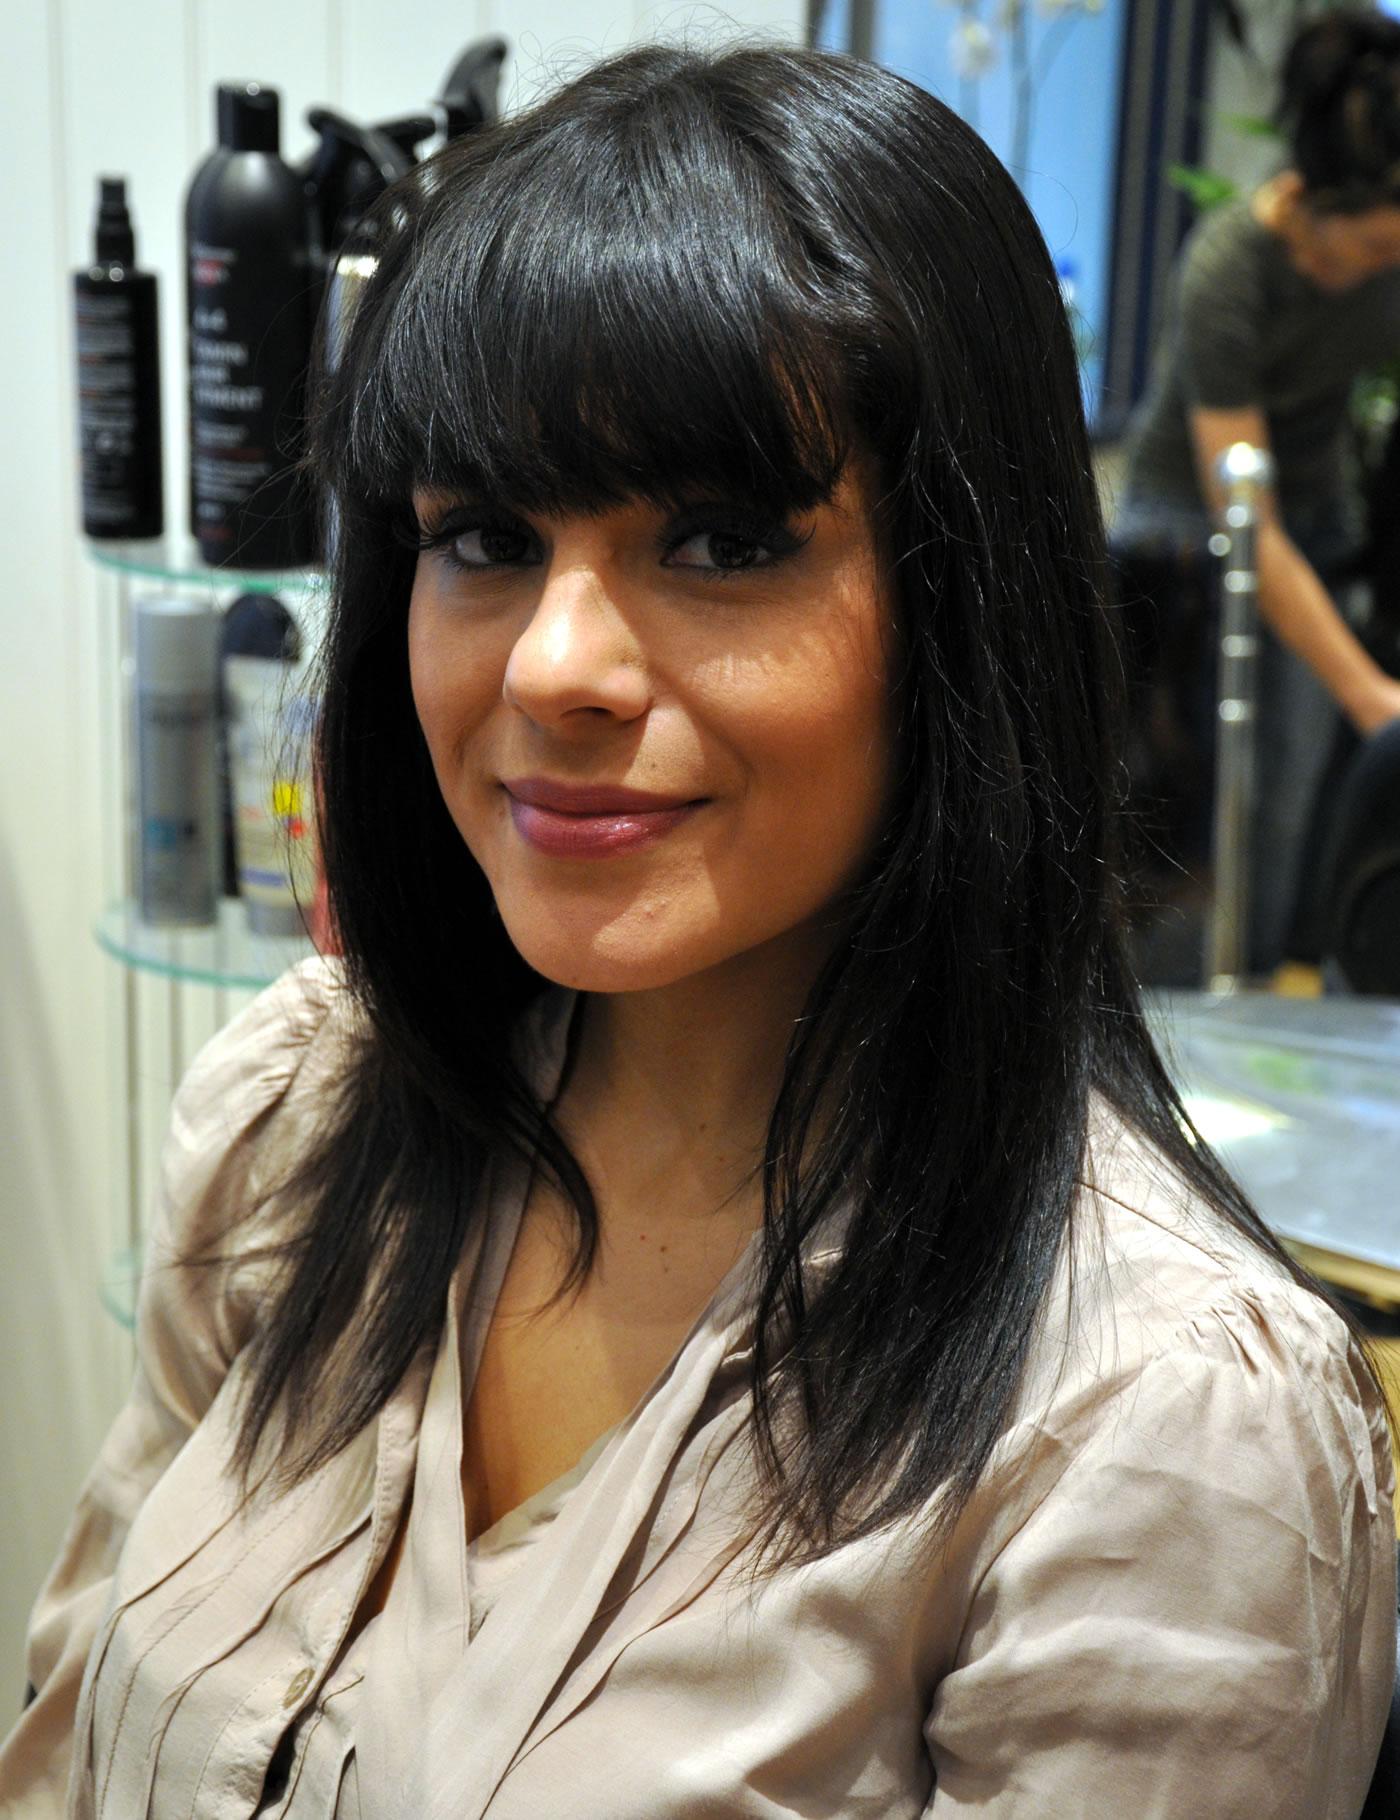 'Glee' Tour cast get hair extensions at Mark Glenn, London - Emma before